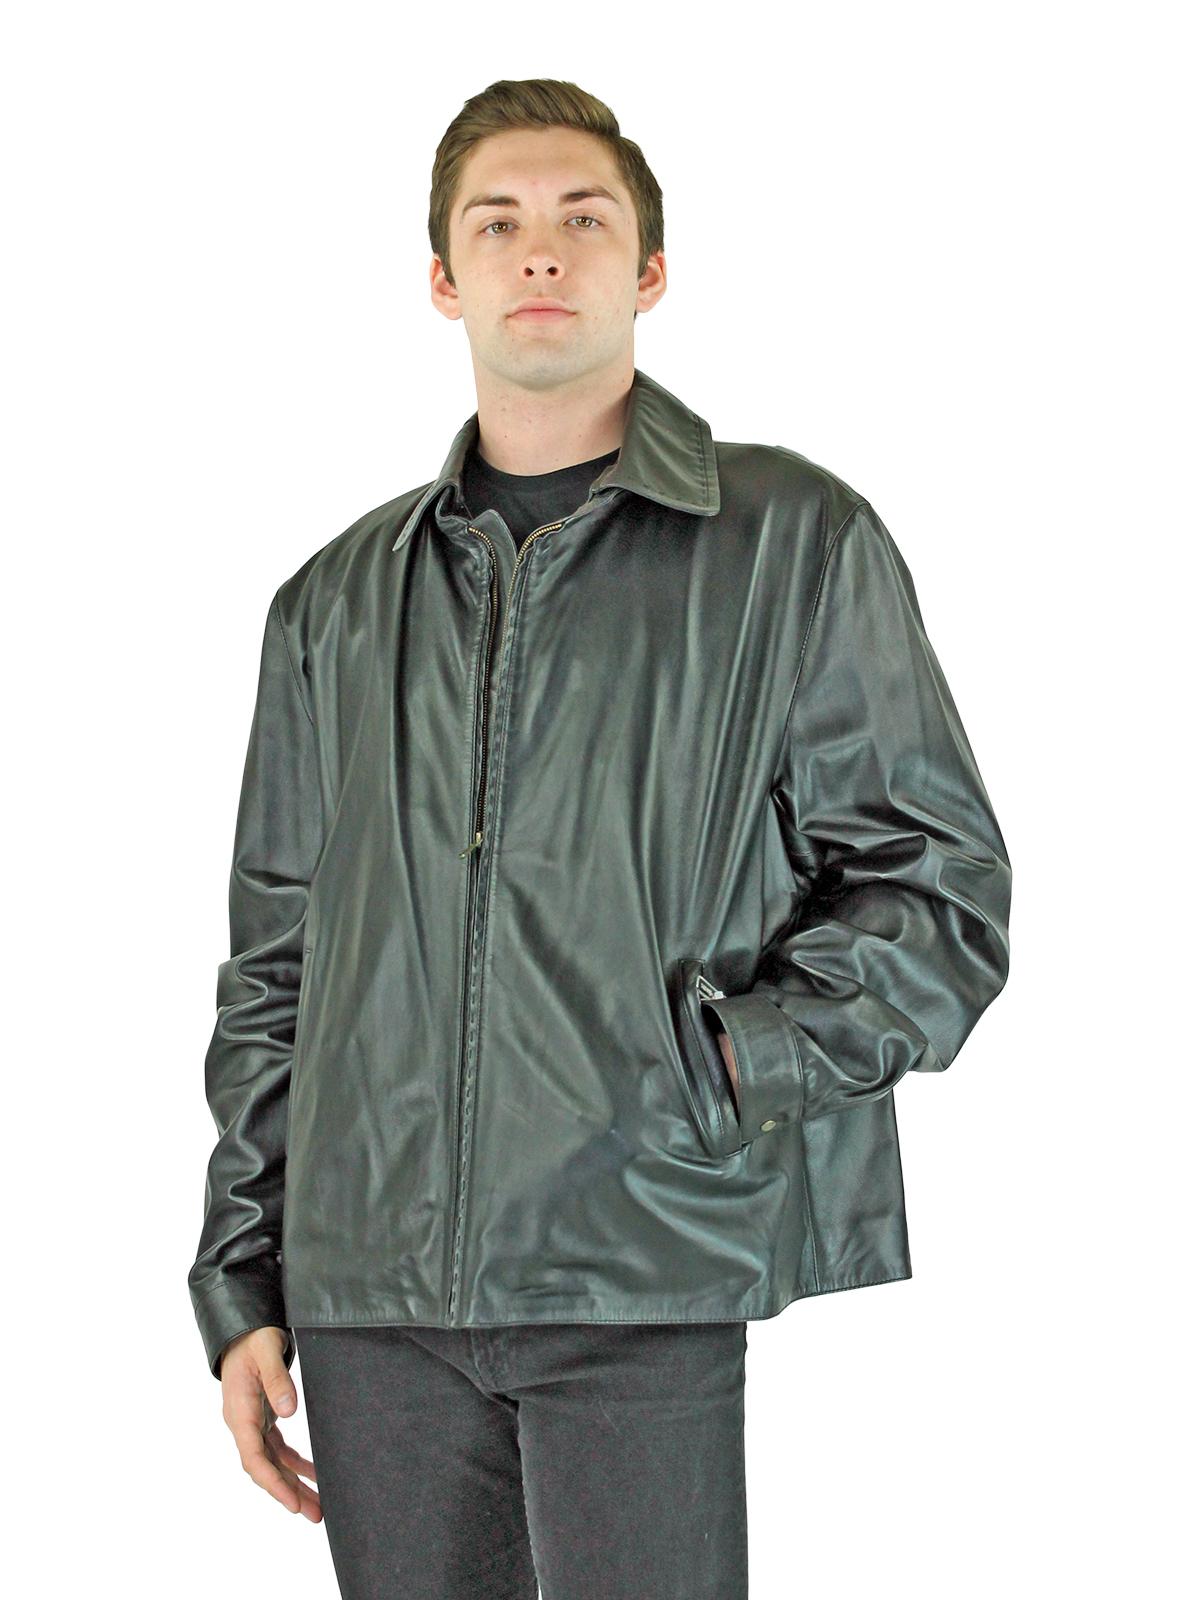 Man's Black Leather Zipper Jacket